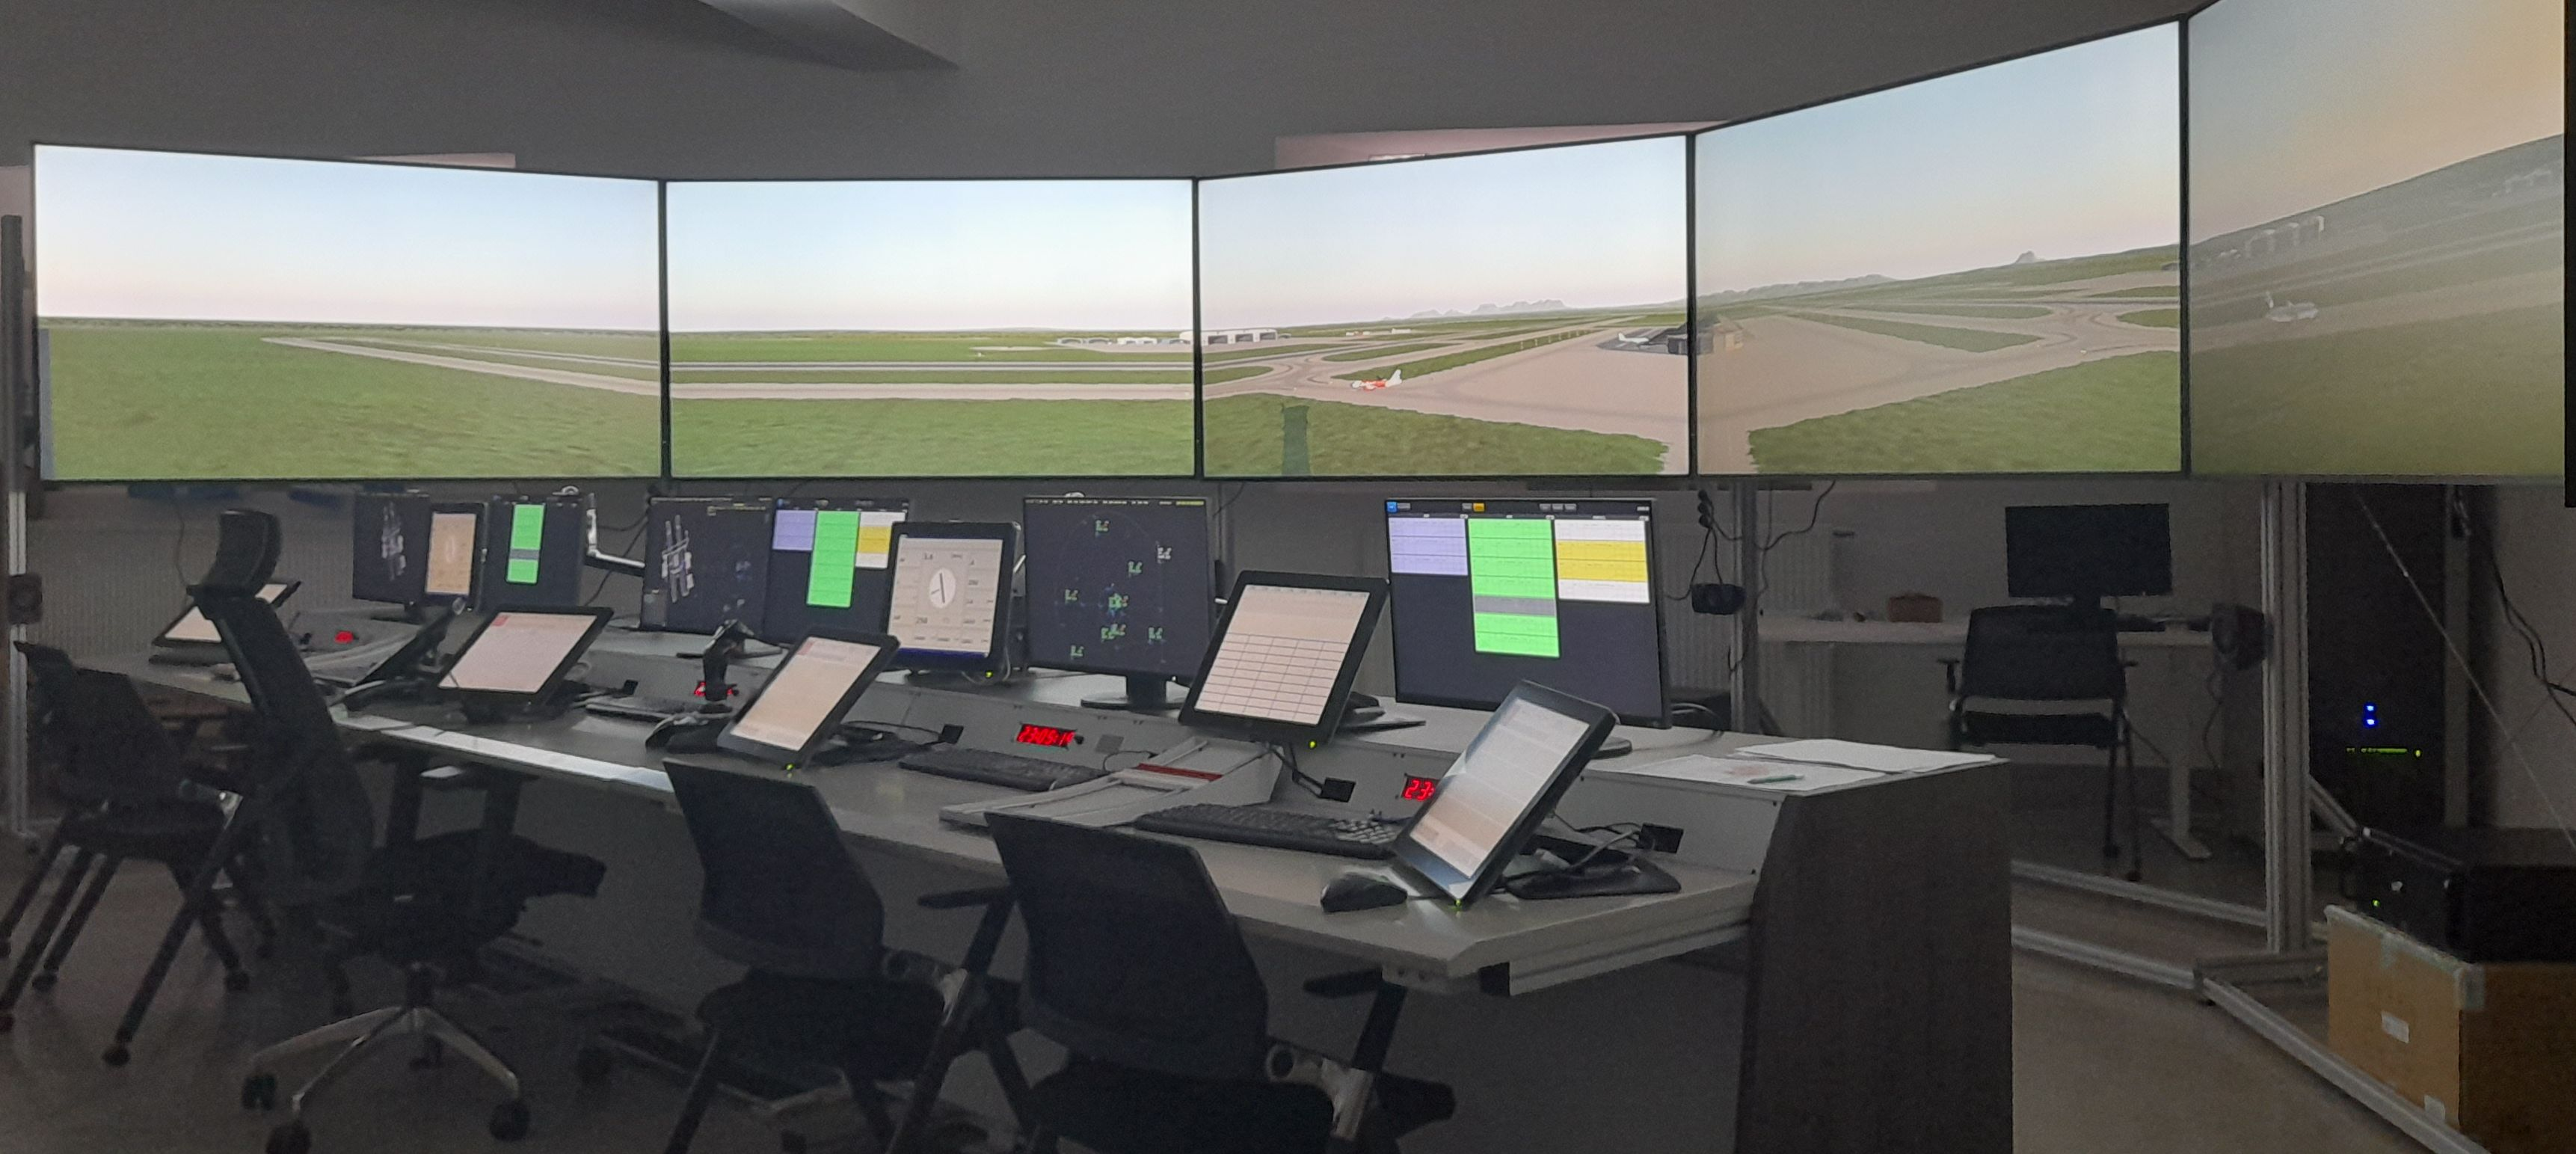 tower-Simulator-6-screens-console-chair-operating-skyradar